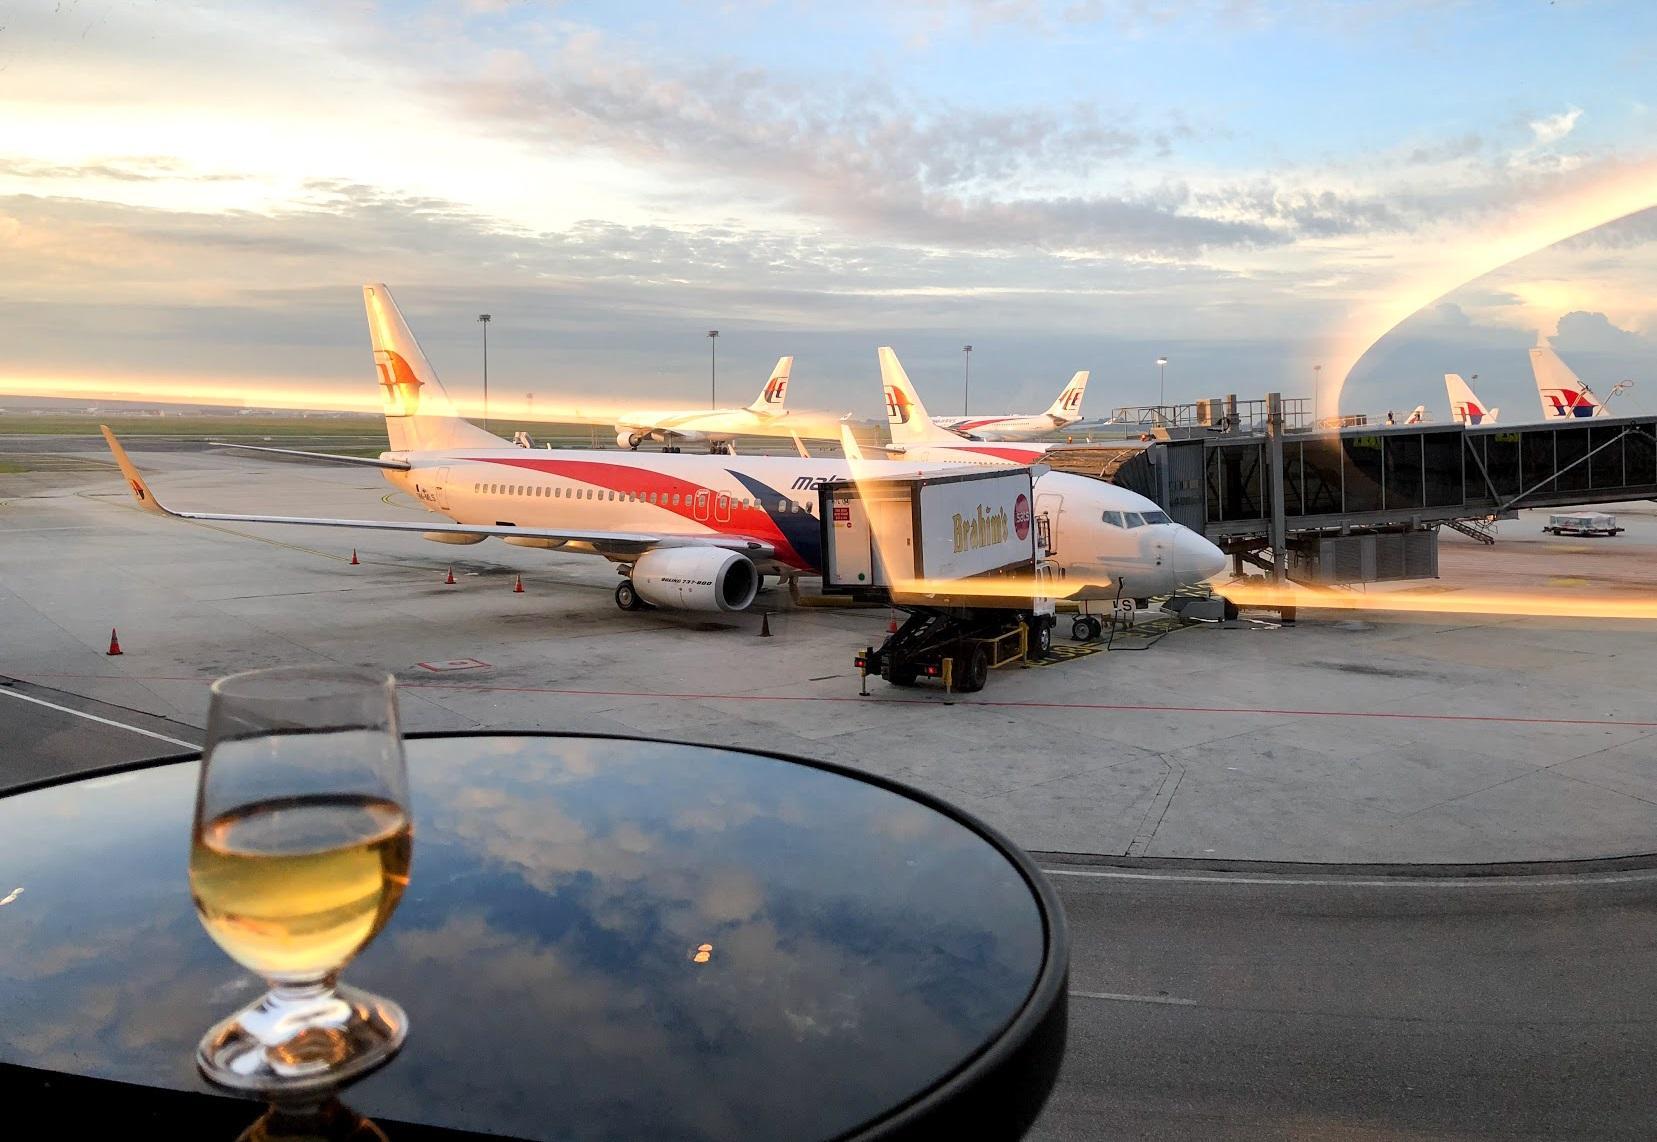 Malaysia Airlines Domestic Golden Lounge Kuala Lumpur tarmac view